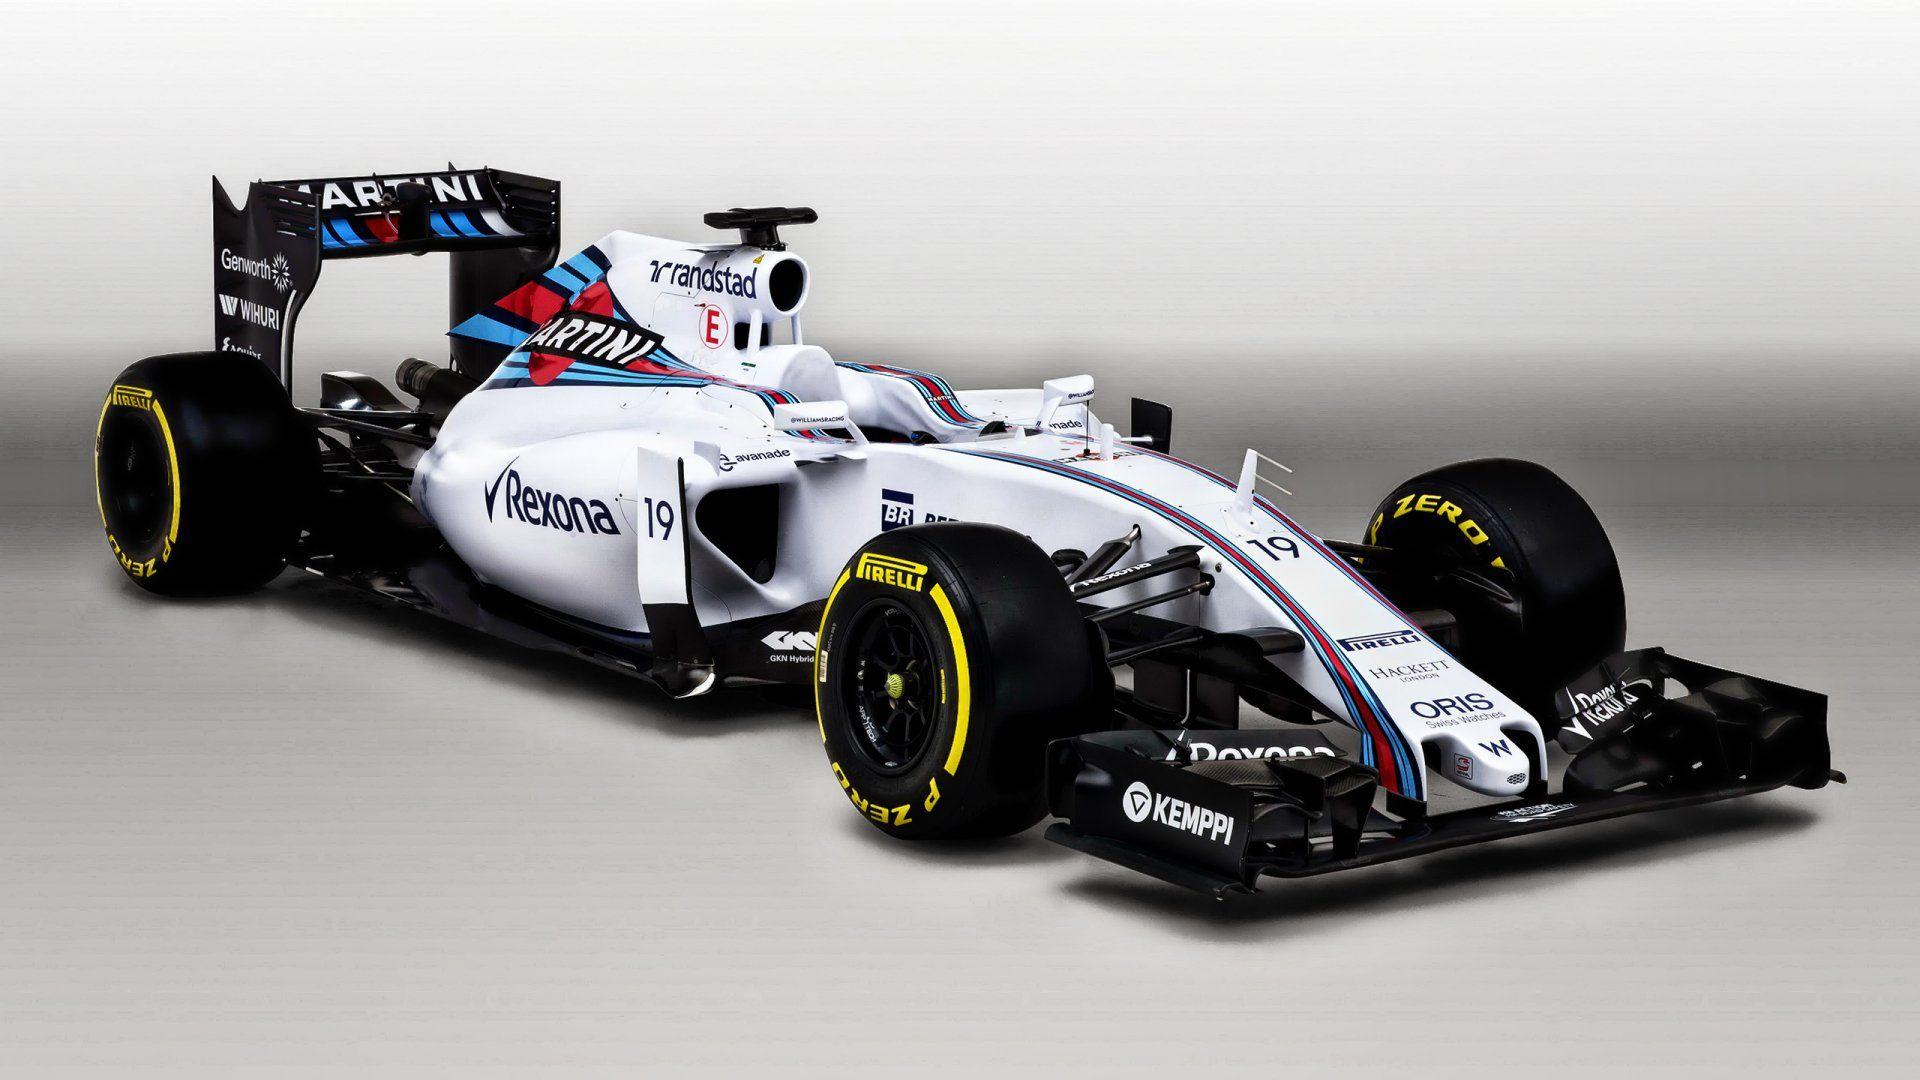 Sports F1 Formula 1 Race Car Wallpaper Autos, Romantico